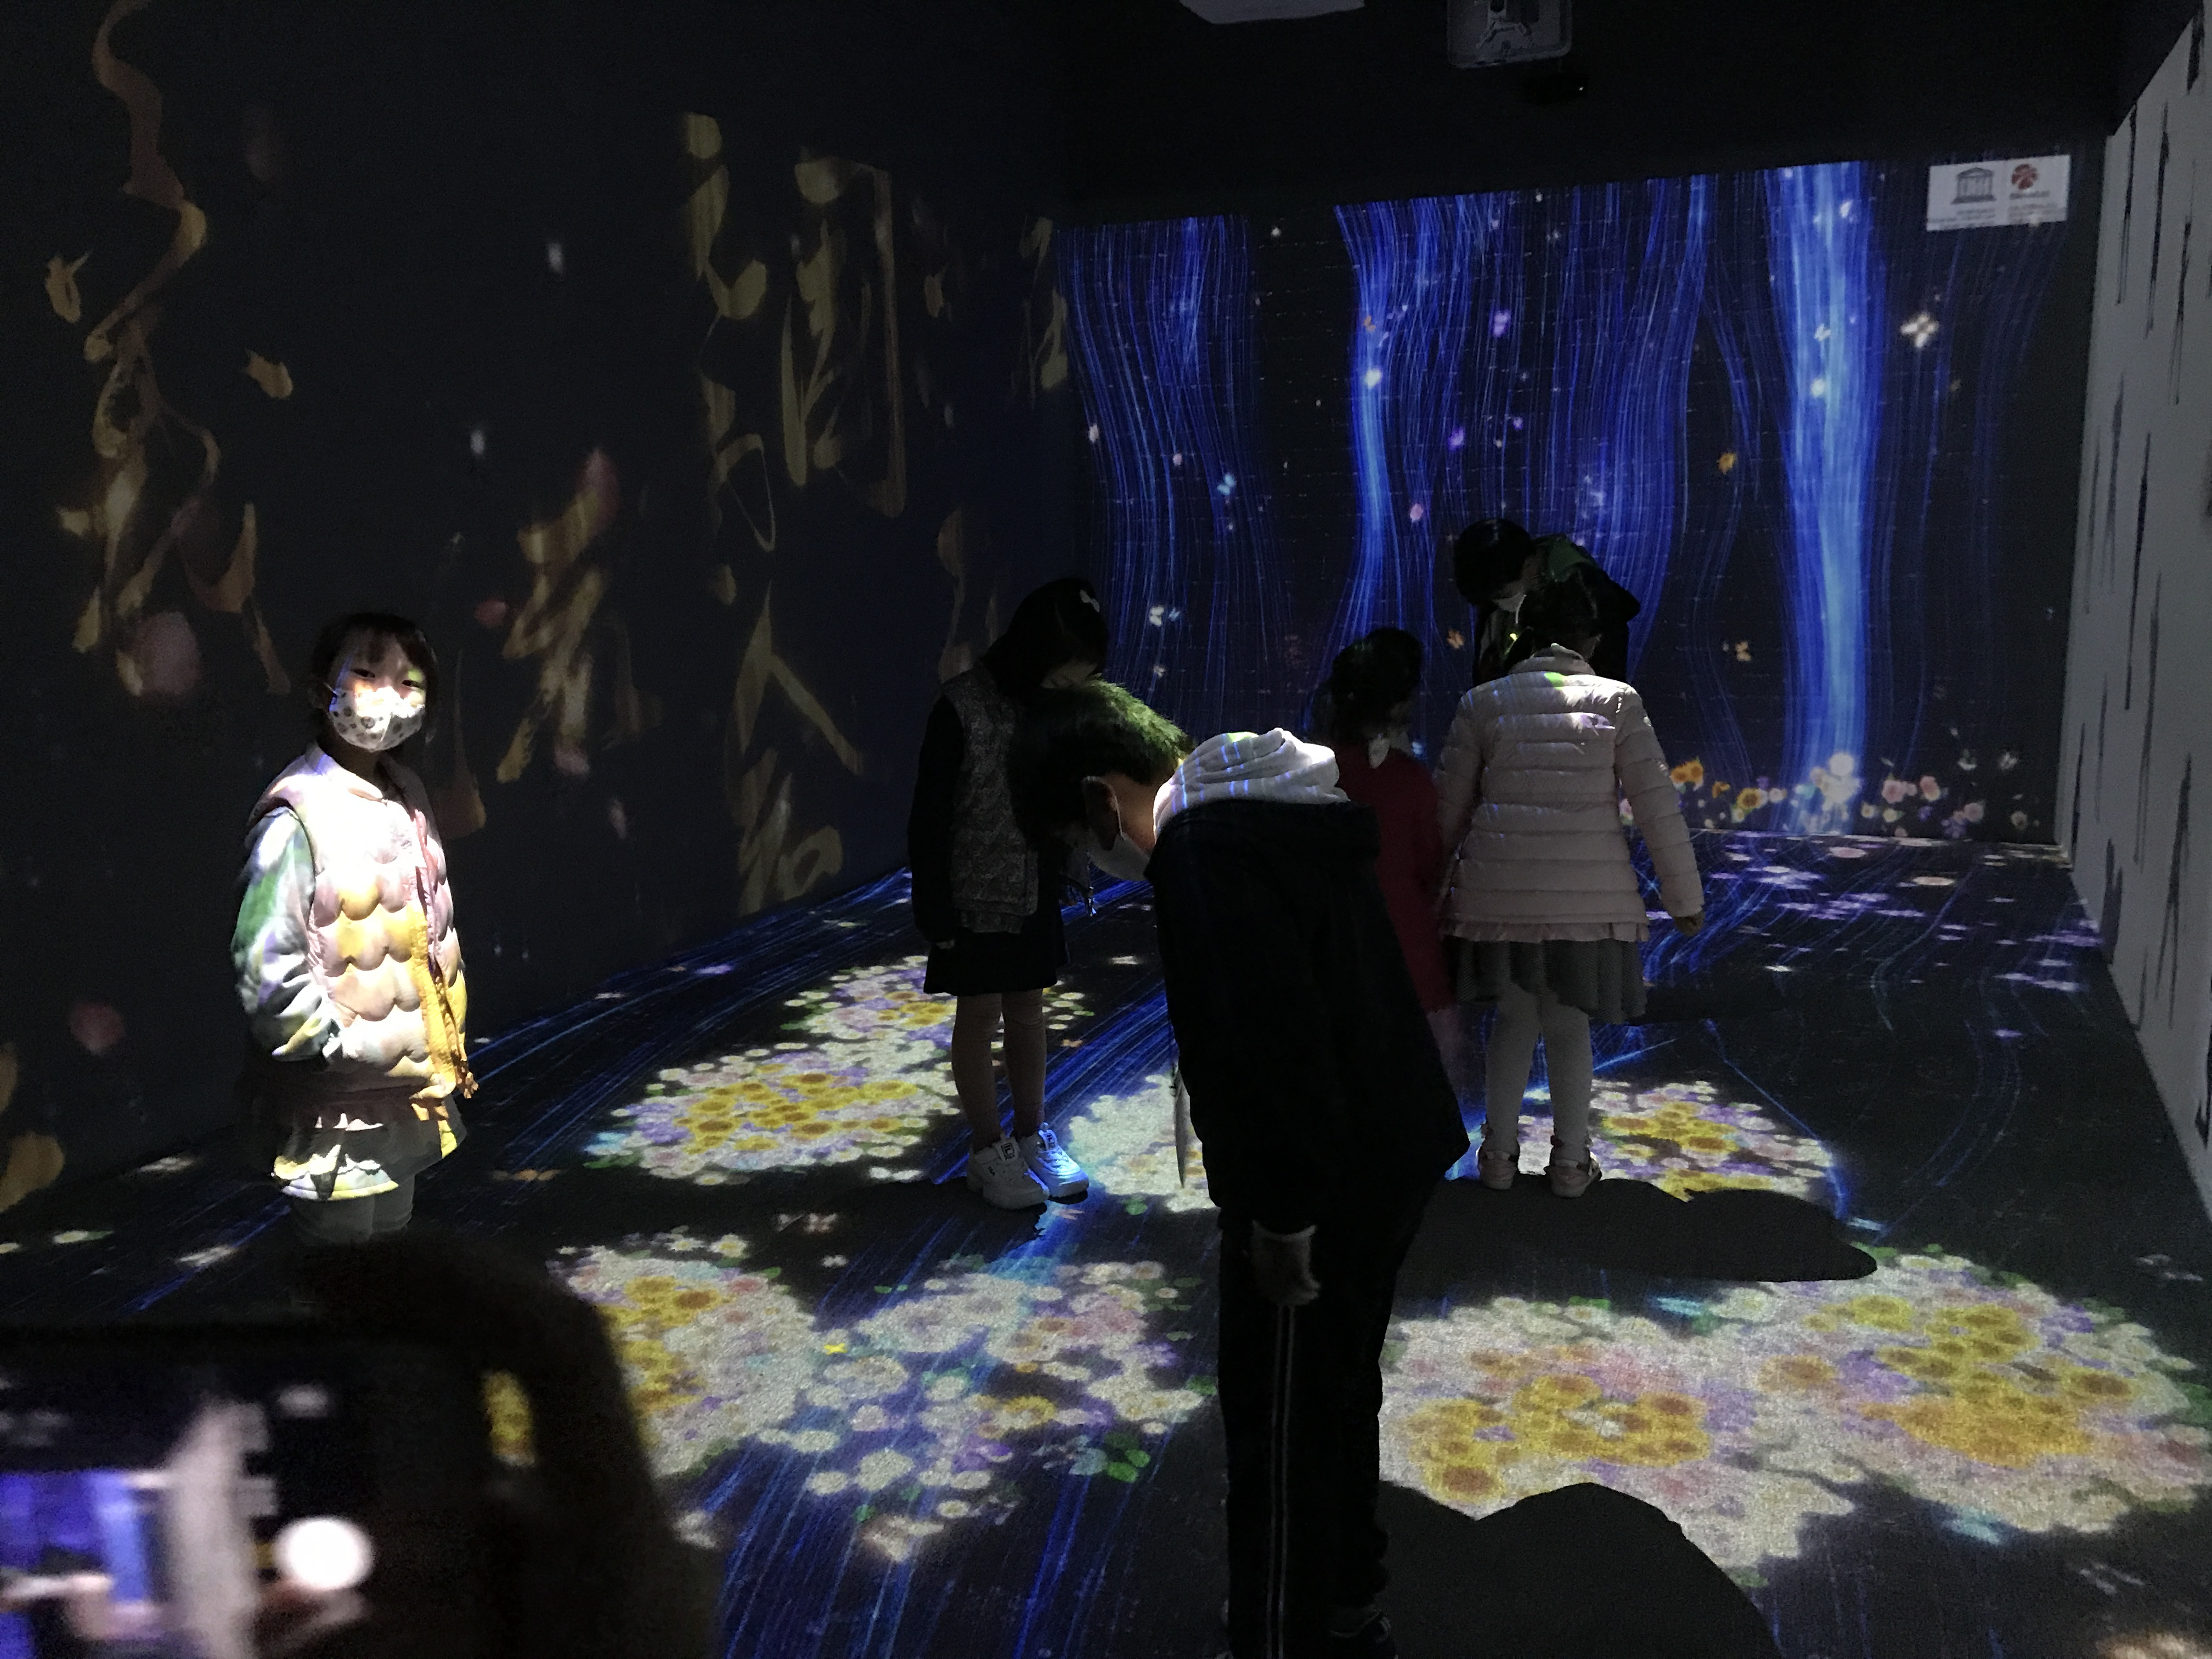 http://www.deyoungmuseum.co.kr/bs/se2/imgup/1606376296KakaoTalk_20201126_162256982_11.jpg